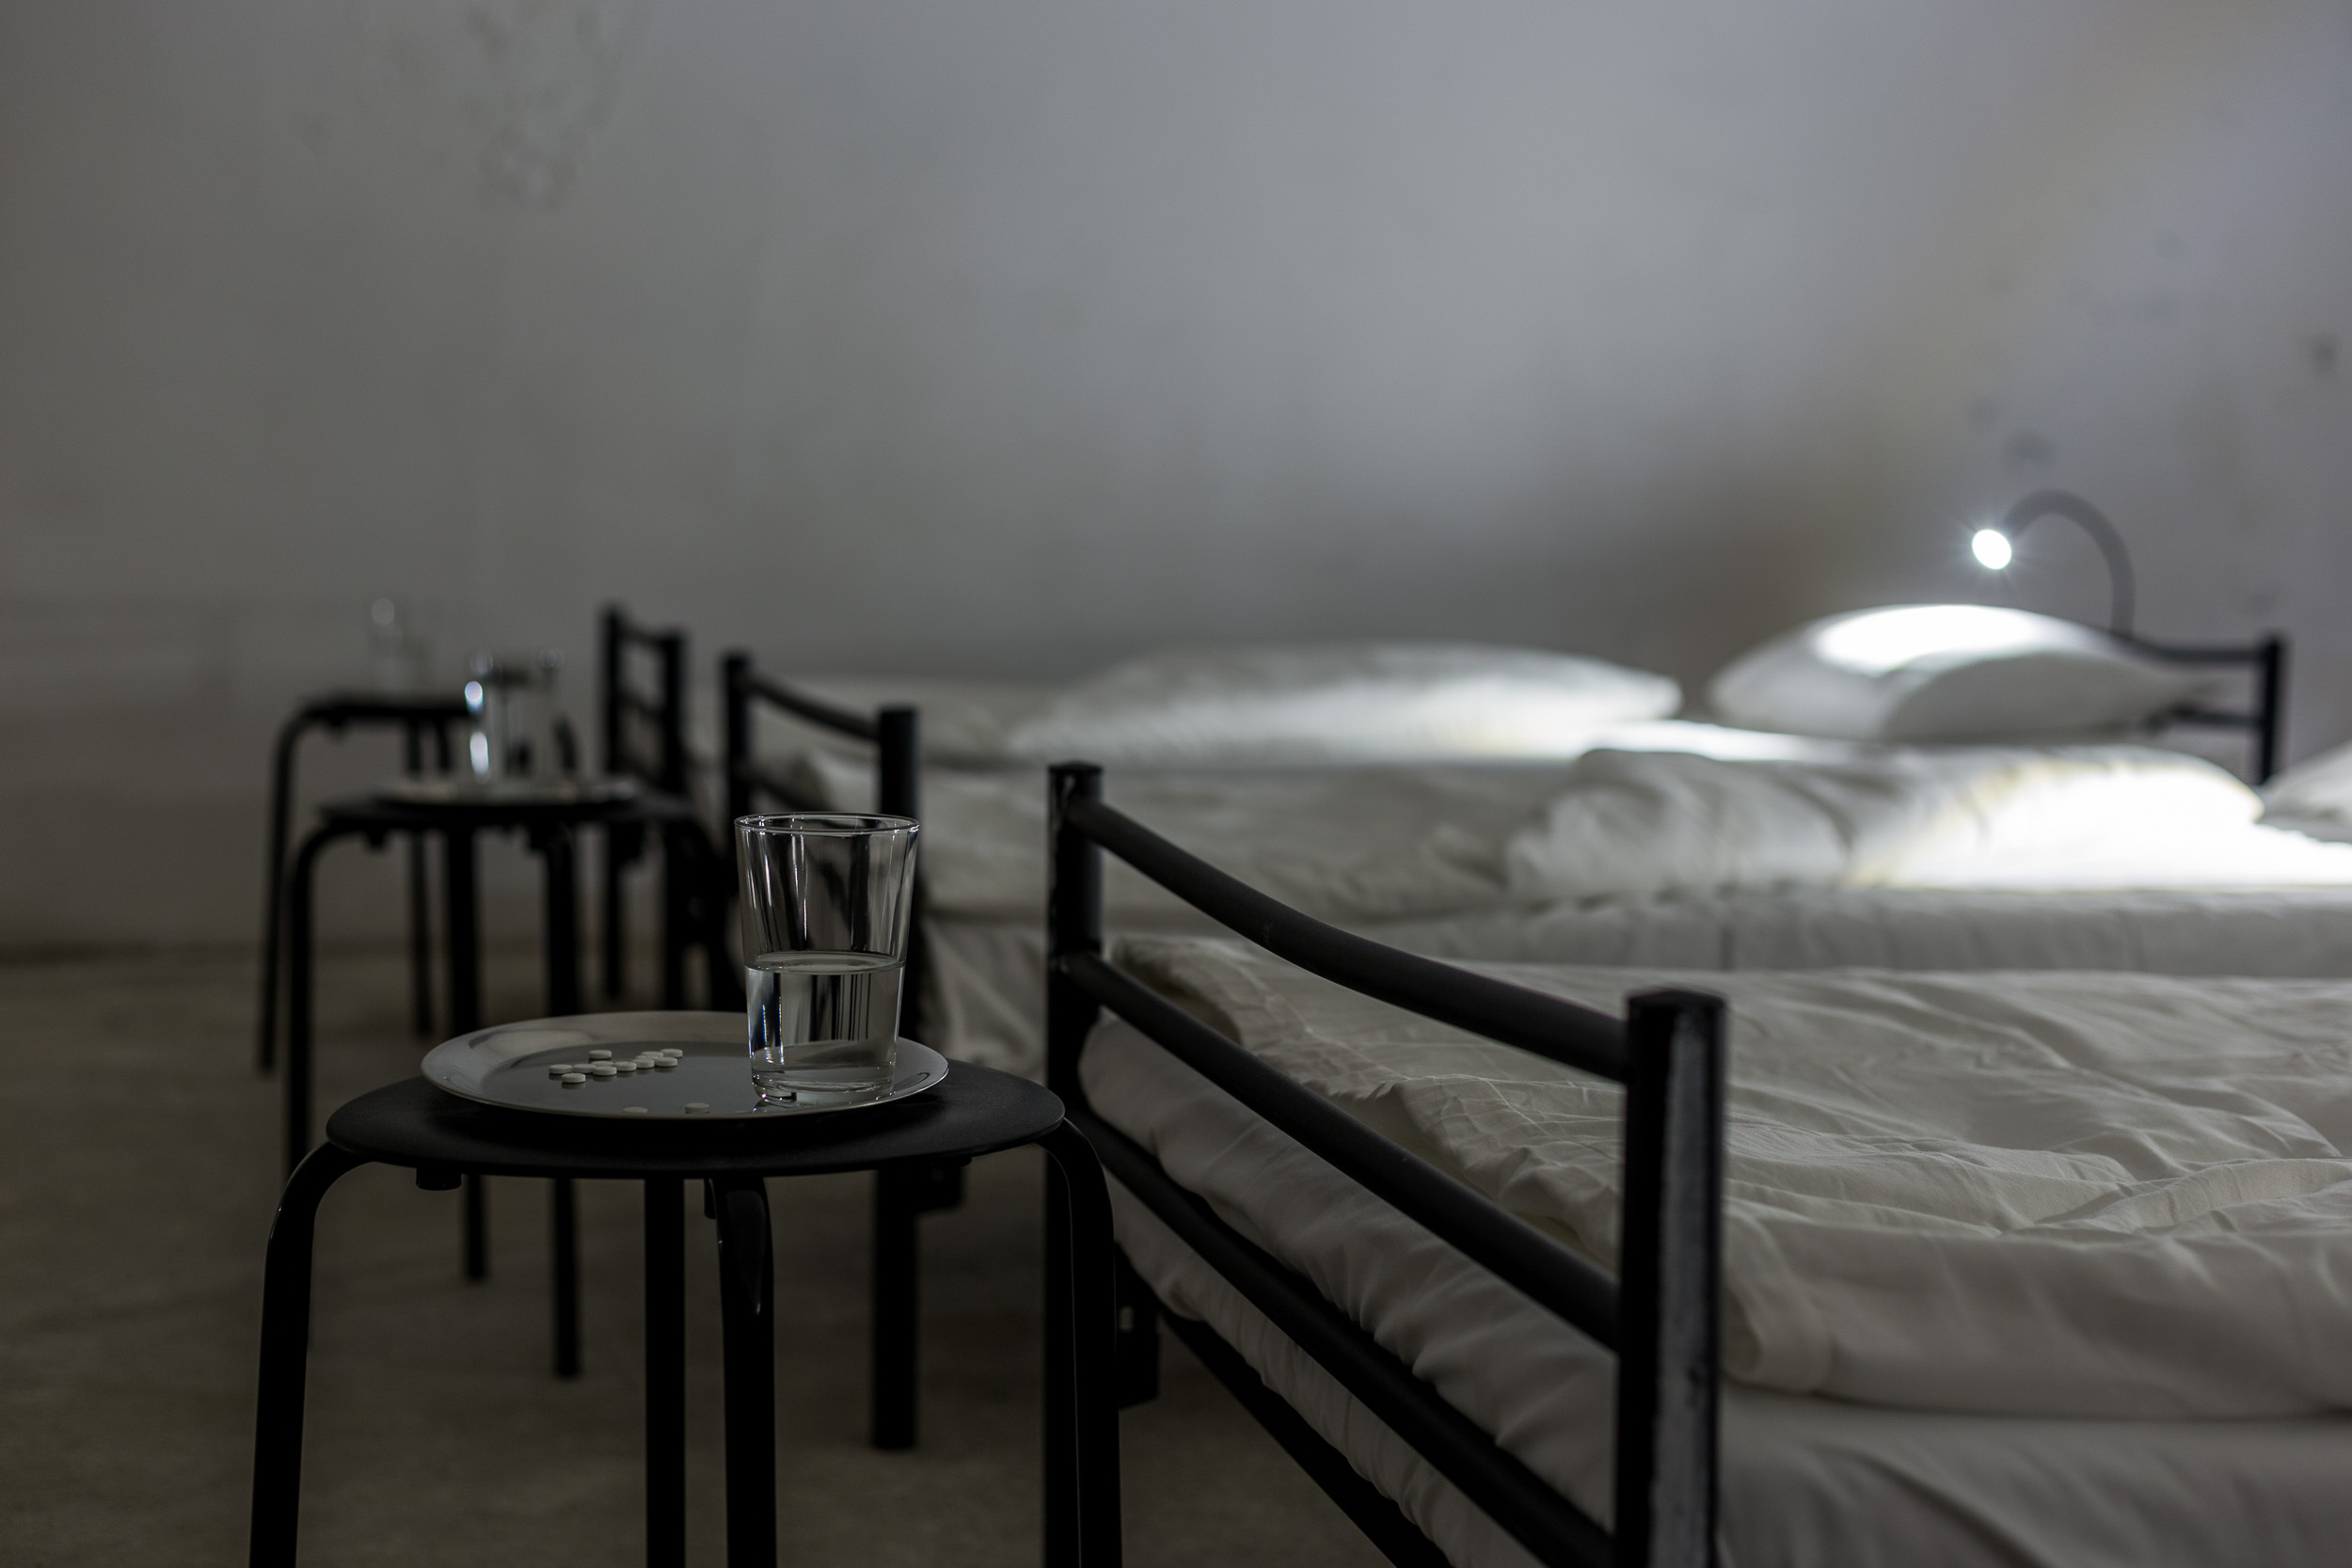 Manon,  Der Wachsaal  (detail),2018, Room Installation, Dimension Variable  Photo: Kilian Bannwart